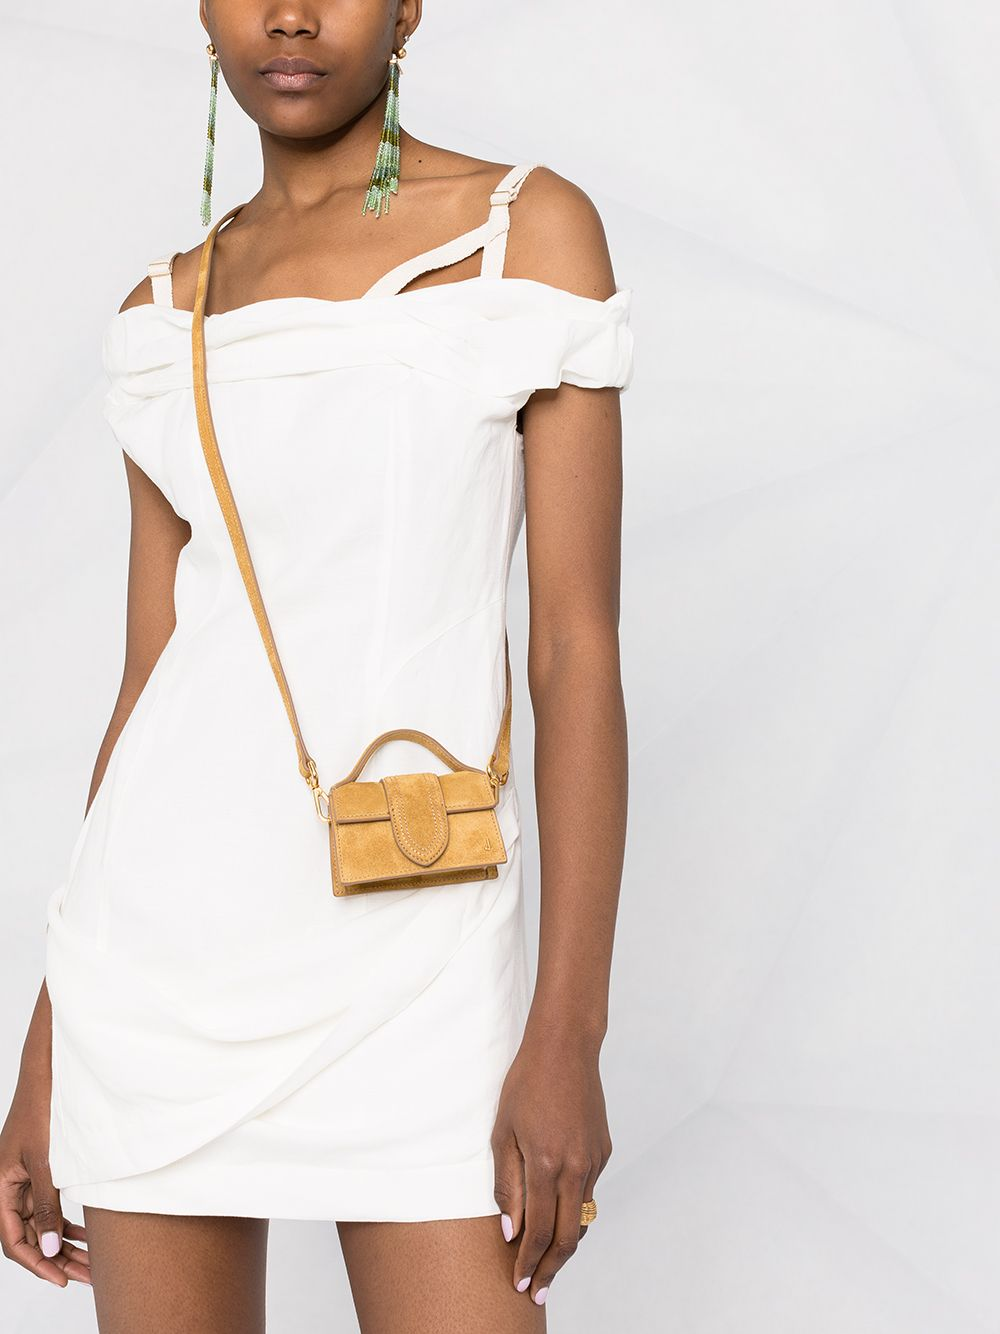 White and ecru cotton and linen minidress  JACQUEMUS |  | 211DR22-111110